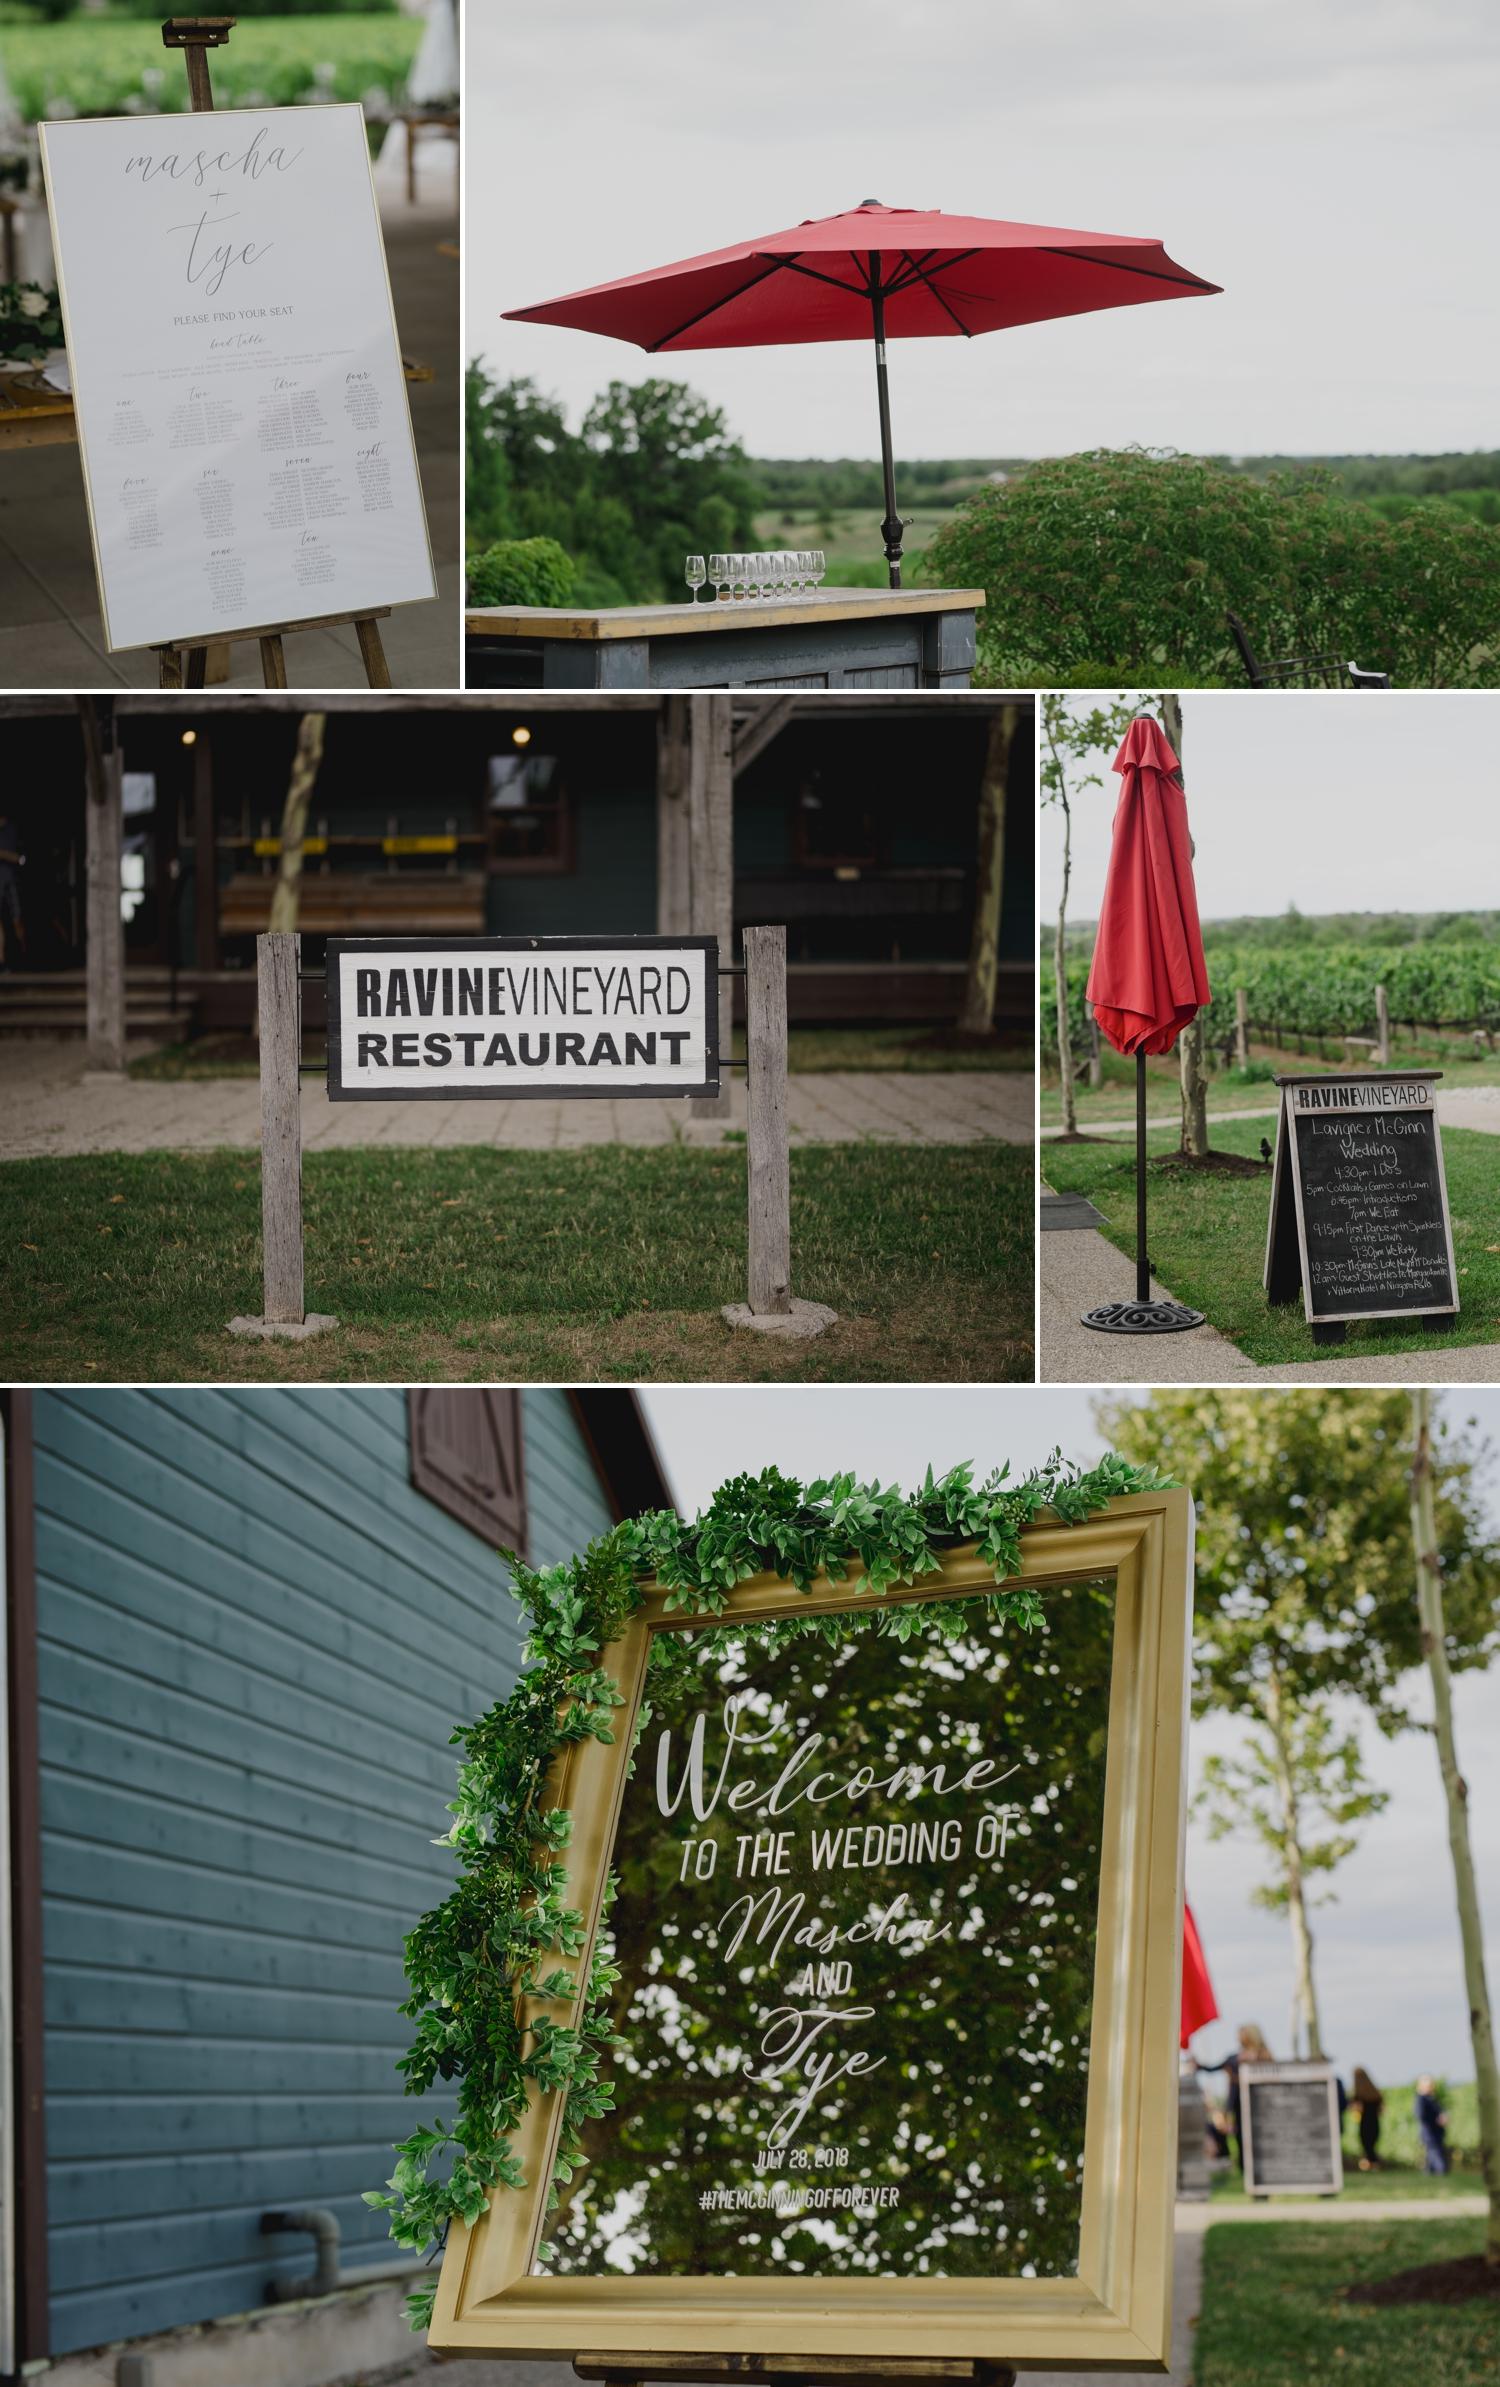 photos of some wedding details at the ravine vineyard in niagara on the lake ontario